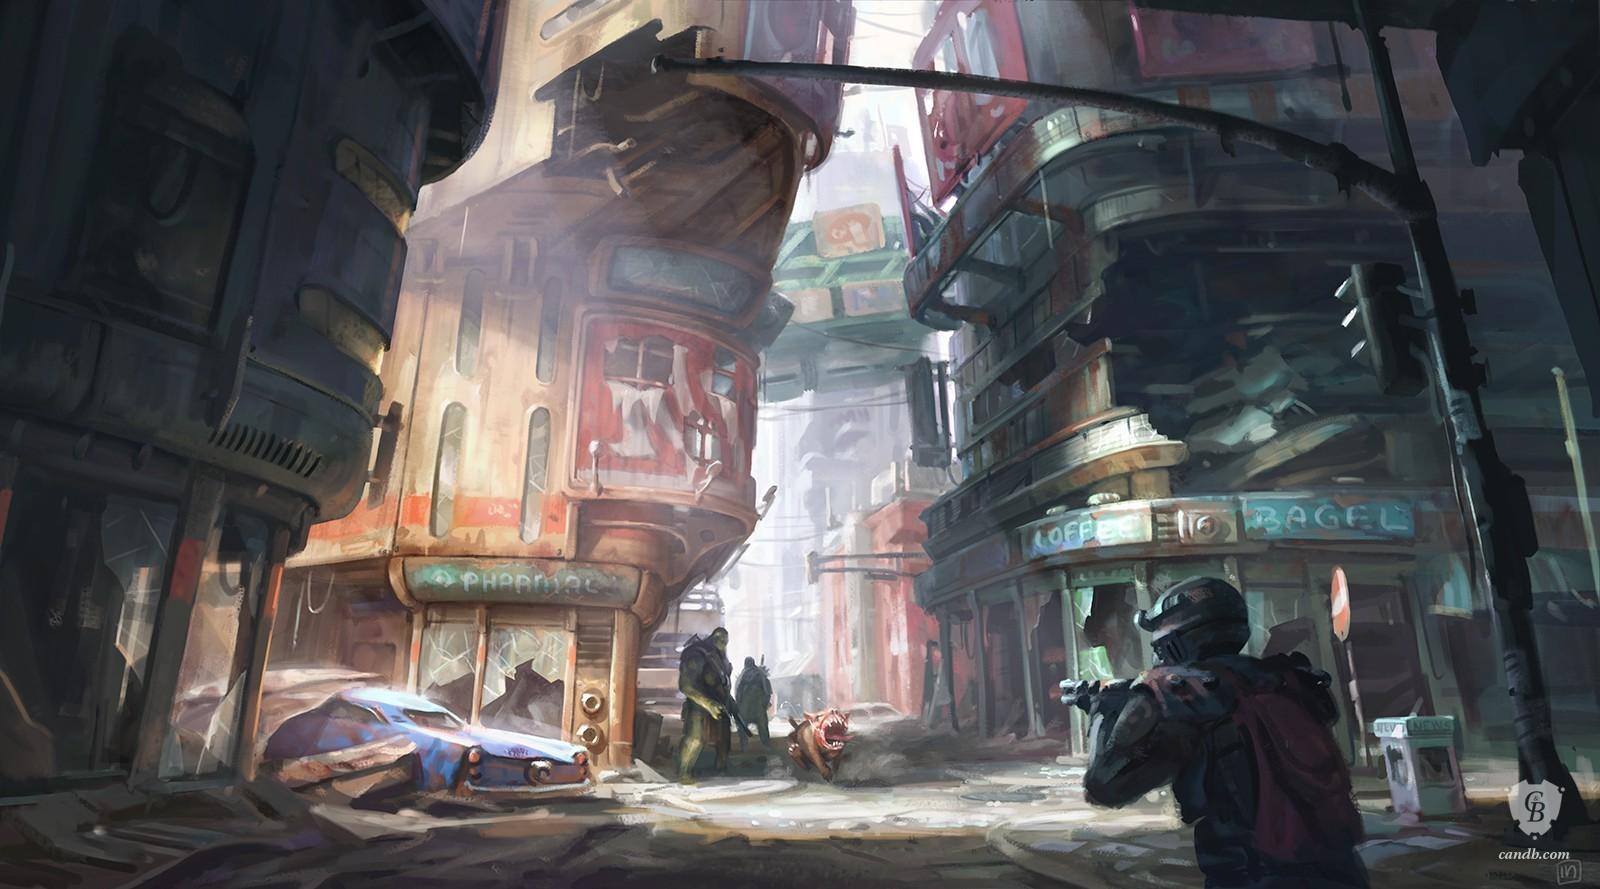 Les artworks qui vous font vibrer (JV) Downtown-financial-district_fallout4_bethesda_1600x889_marked